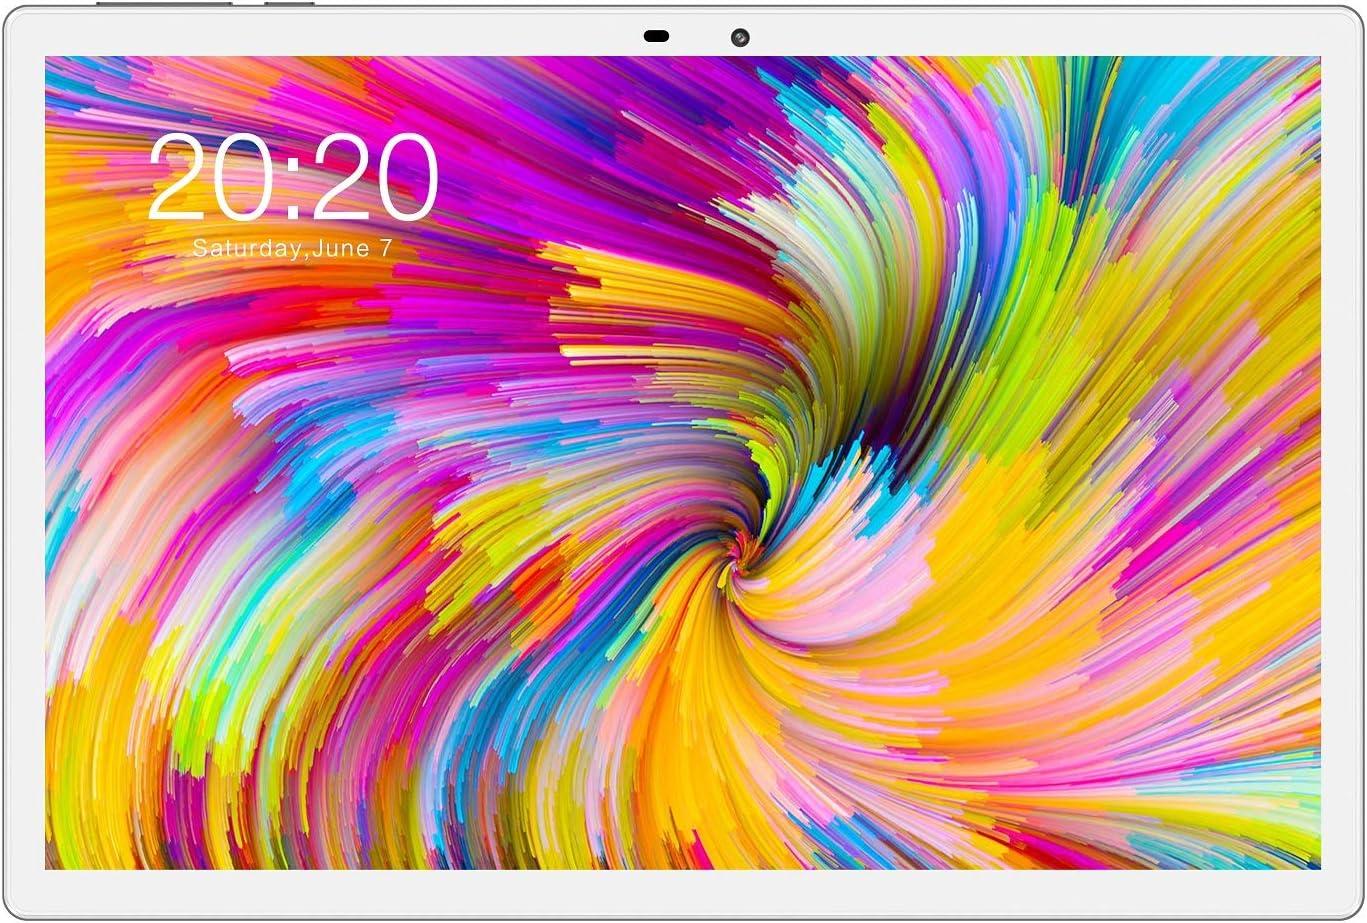 TECLAST M30Pro Tablet PC 10.1 Pulgadas 4GB RAM+128GB ROM FHD 1920x1200, Android 10 Octa-Core 2.0 GHz MTK Helio P60, Bluetooth, 4G Dual SIM/SD, Type-C, 5+8MP Cámara, WiFi+Cellular+GPS, 7500mAh Batería